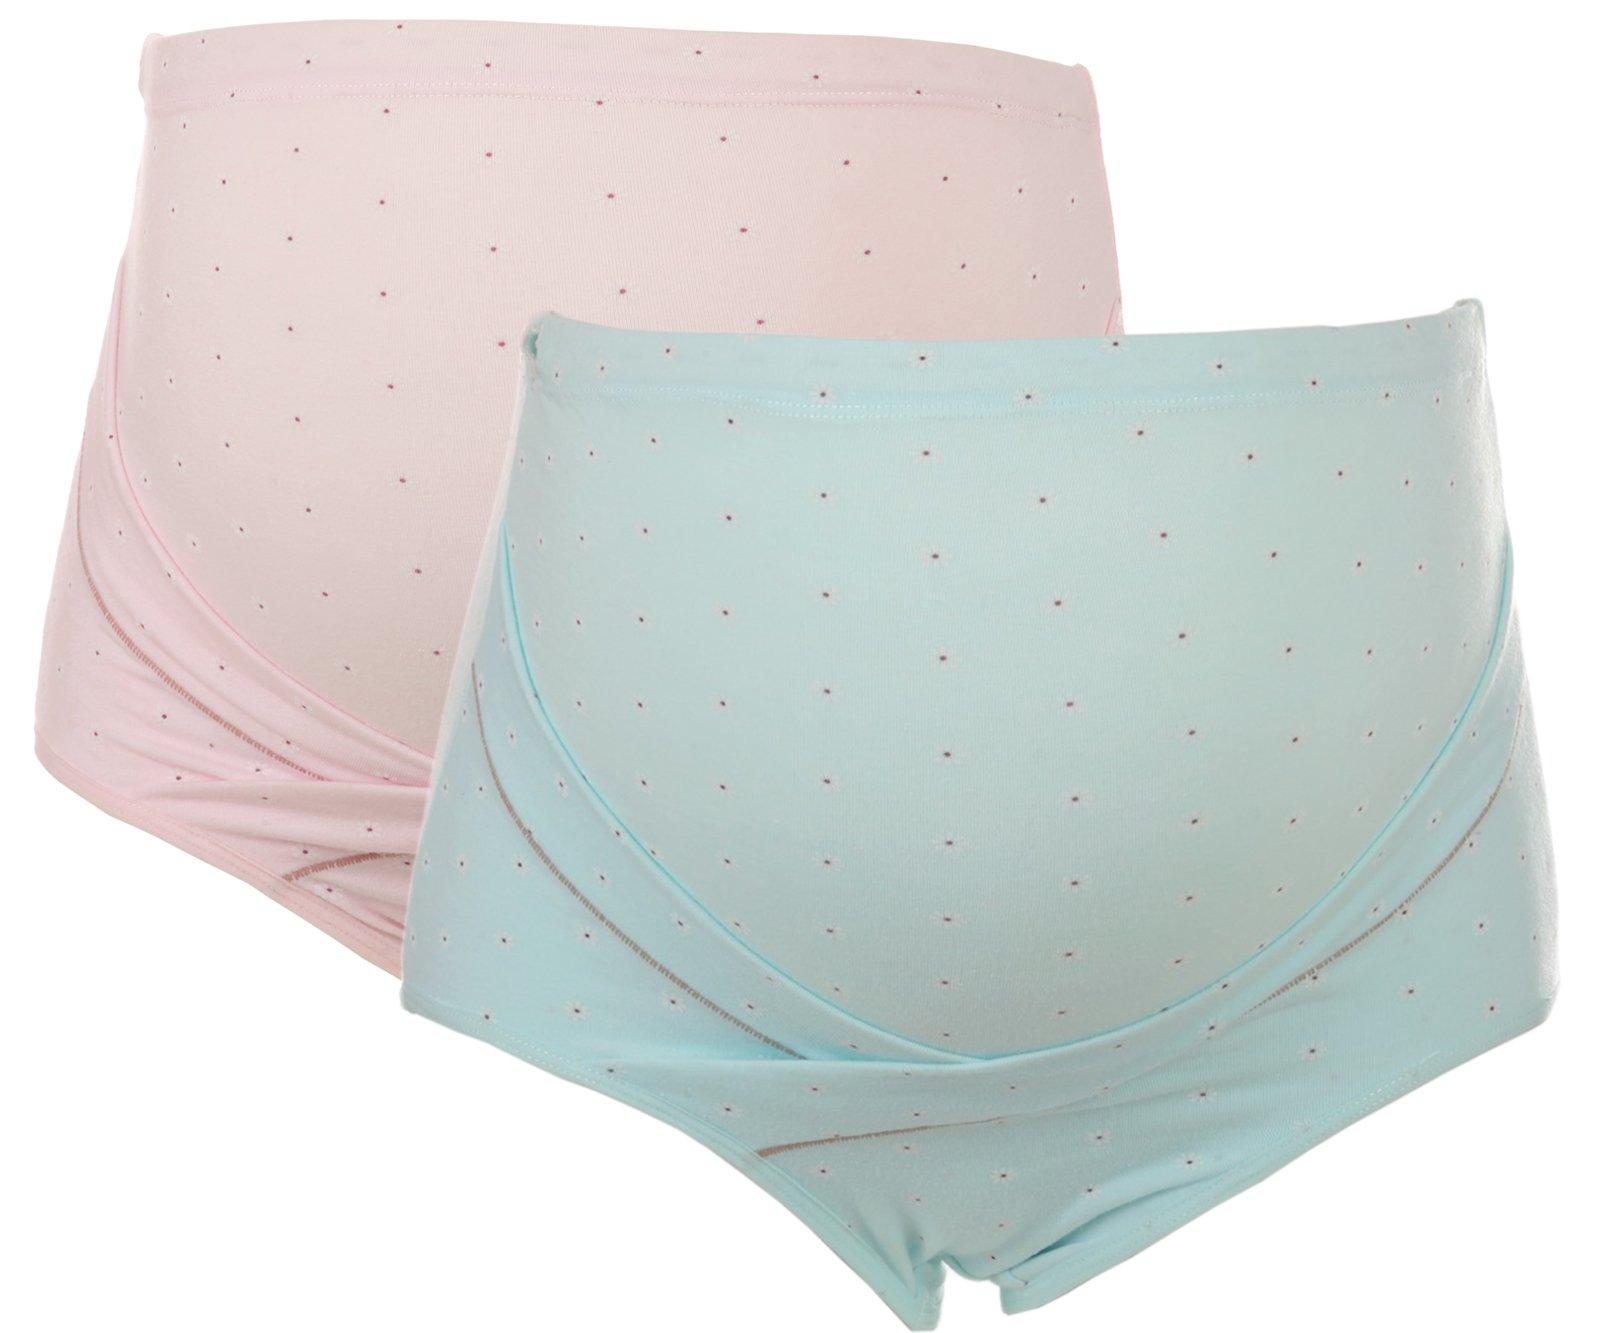 Unilove Comfortable Maternity Underwear Panties Over Bump Pregnant Women Briefs (M/L, Pink & Blue)